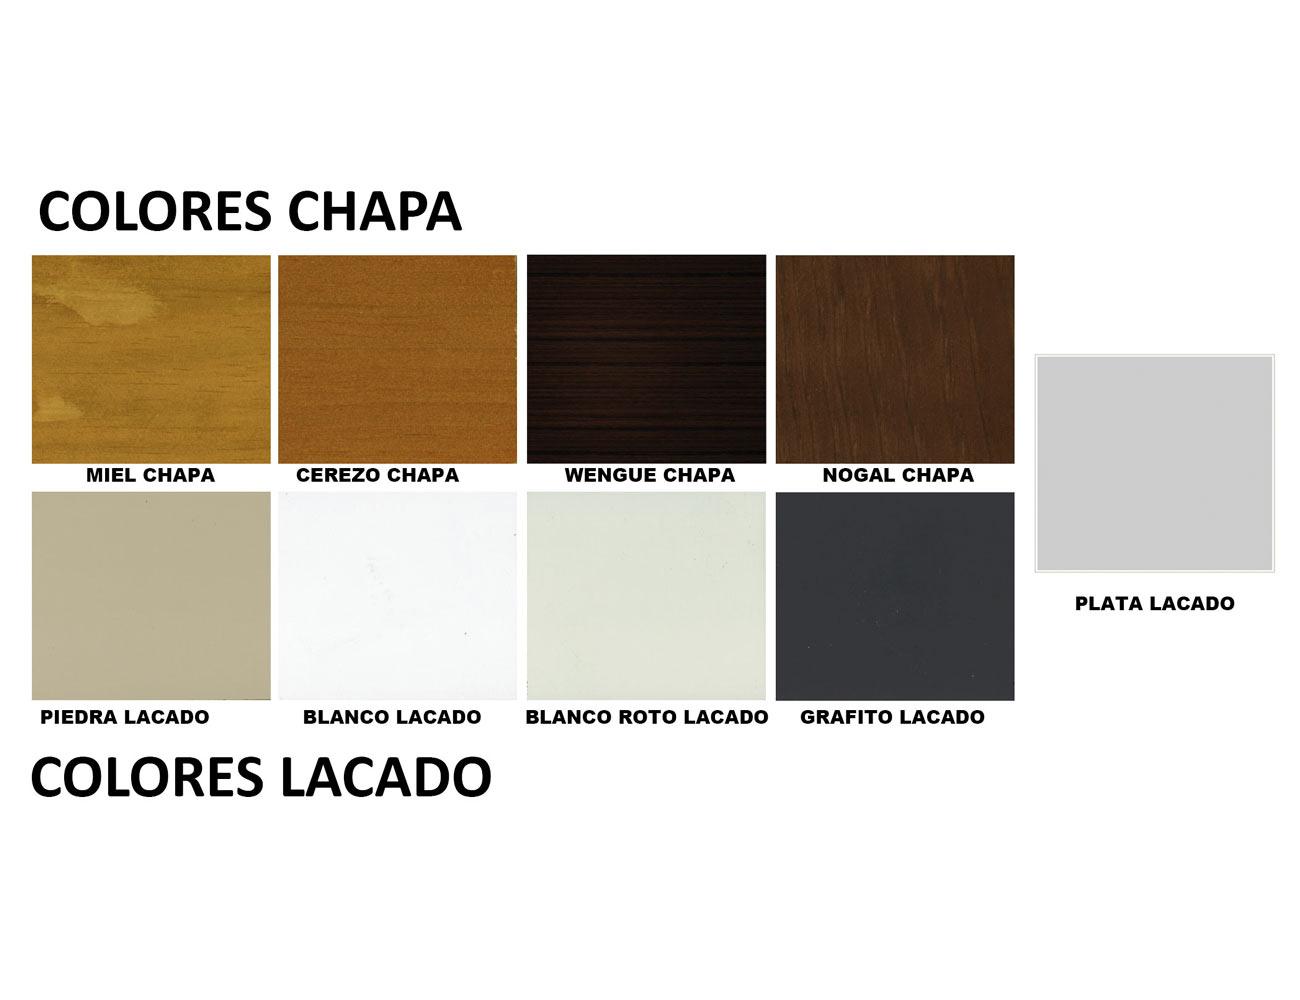 Colores225